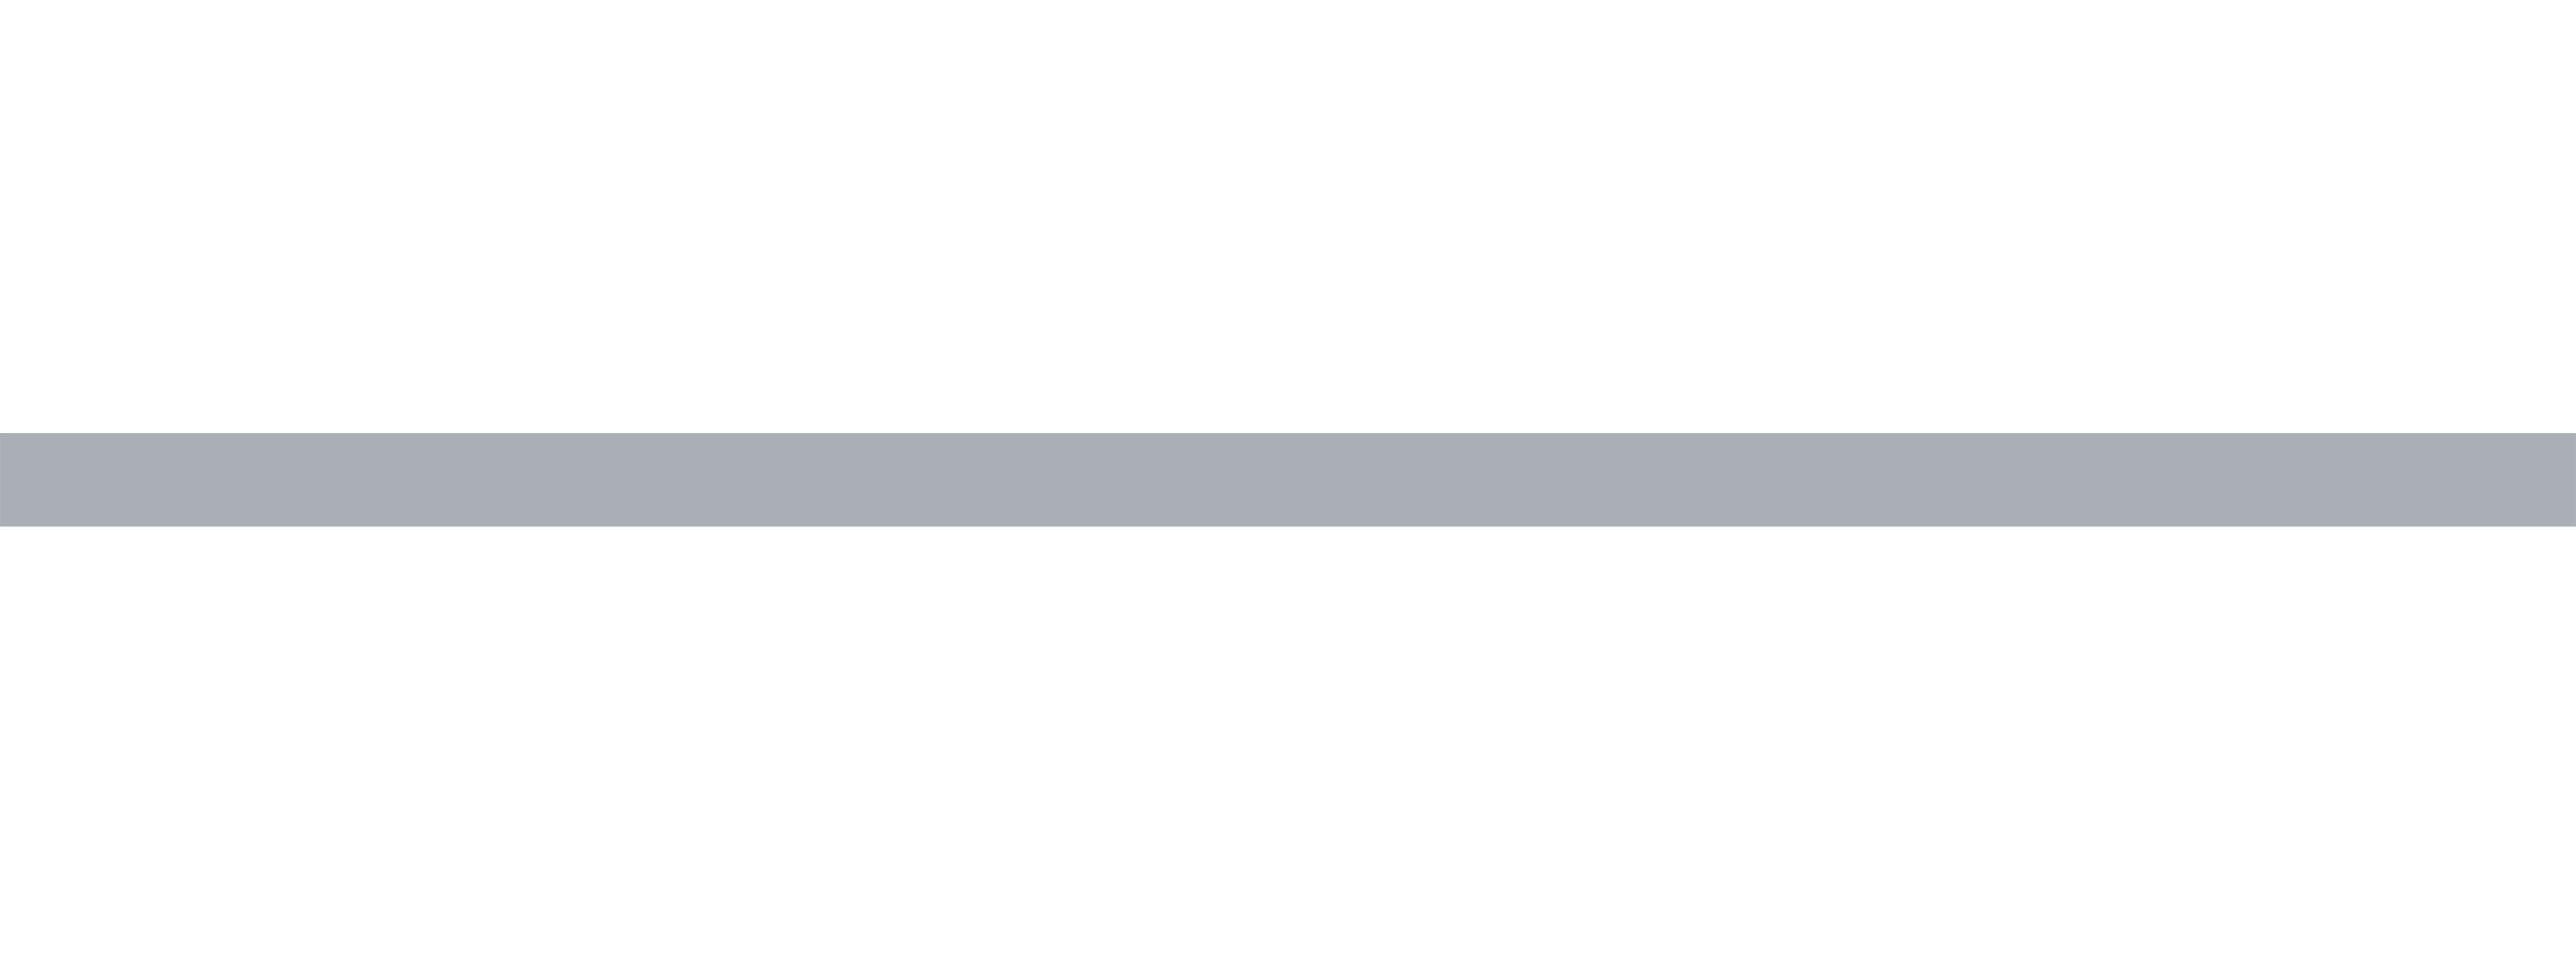 ikea veddinge sockelleiste 220x8 in grau 802.210.26-80221026